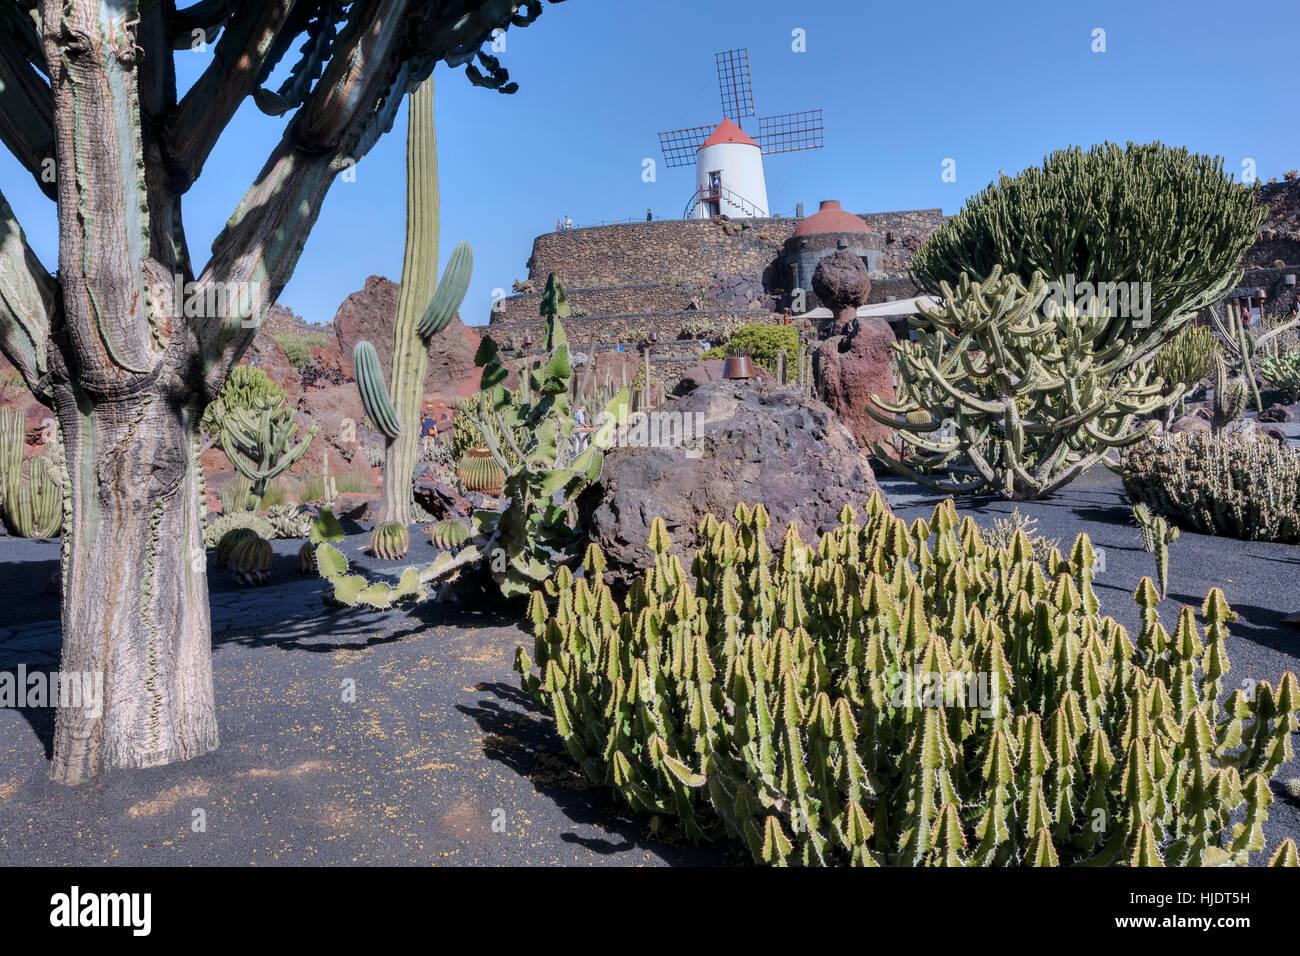 Jardin de Cactus, Guatiza, Lanzarote, Canary Islands, Spain - Stock Image